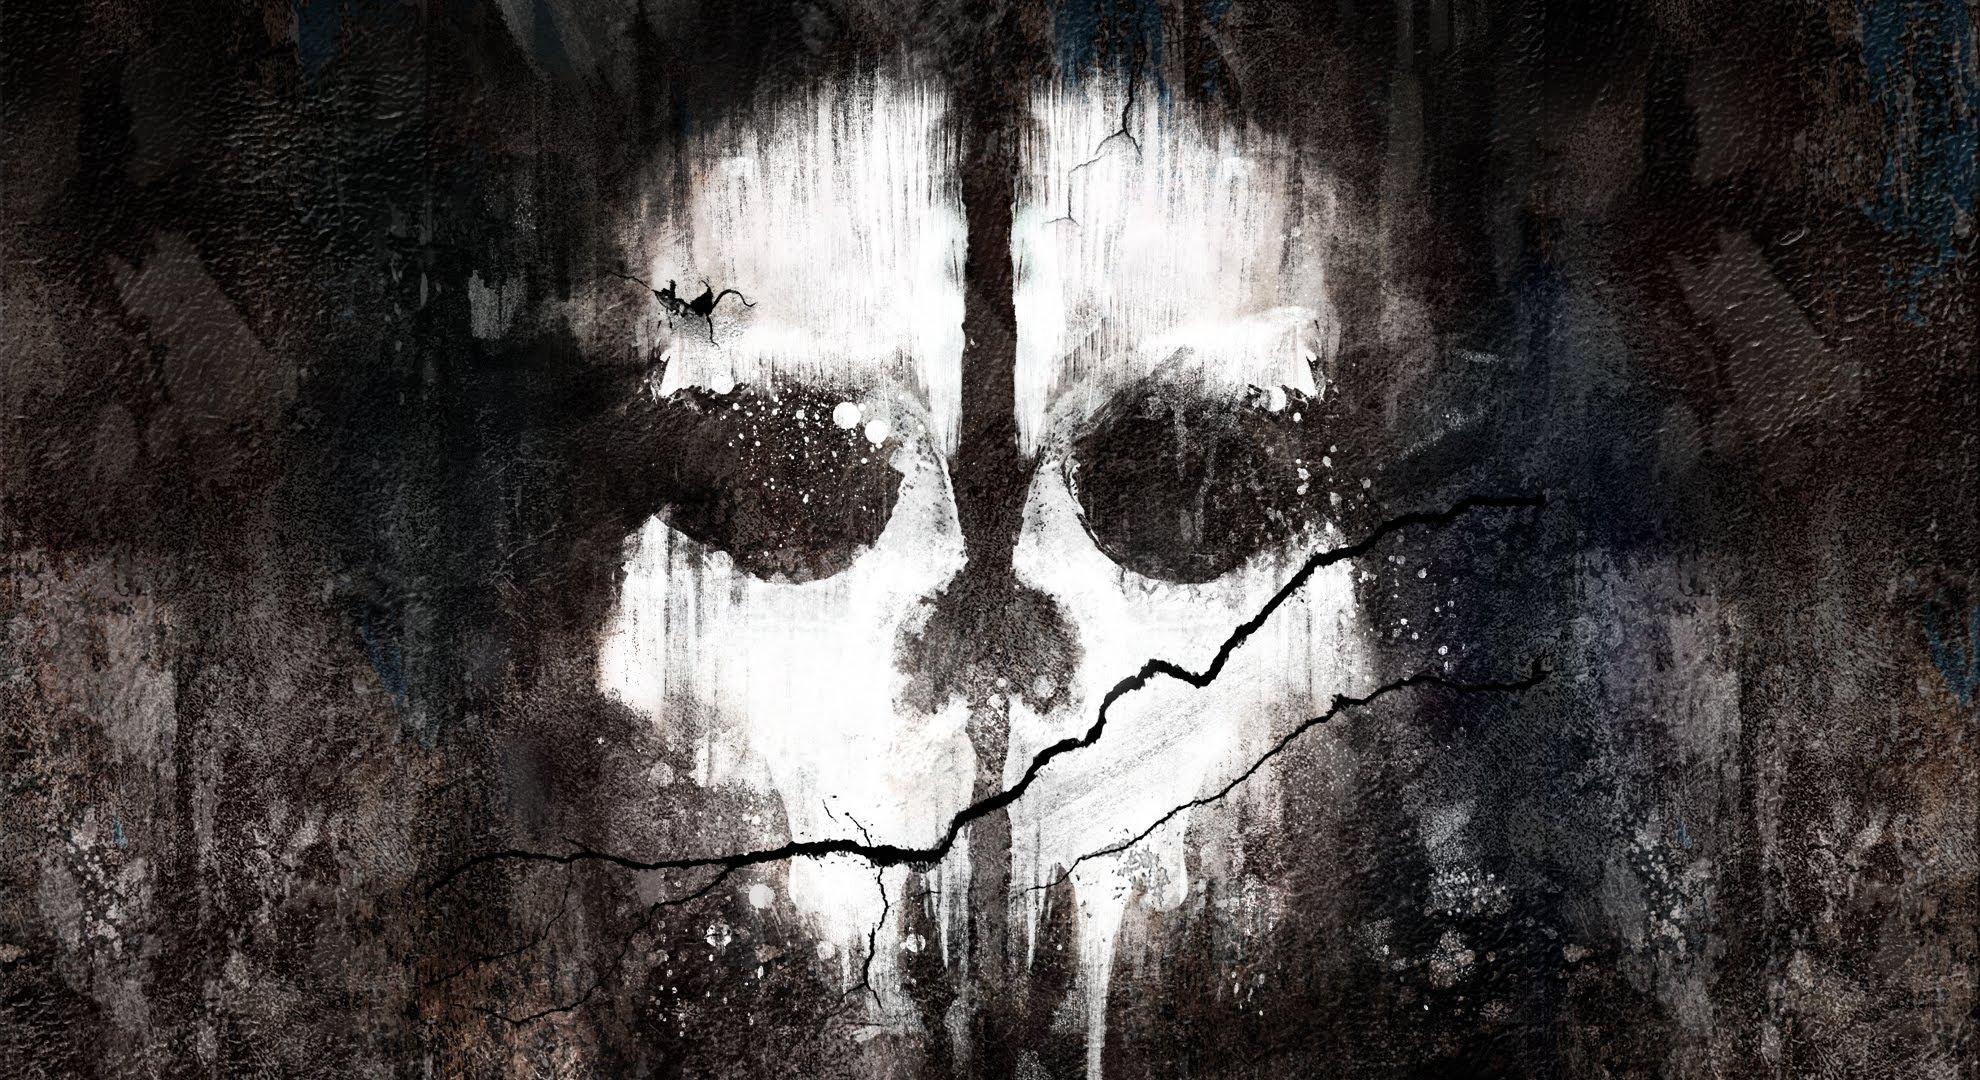 Call-of-Duty-Wallpaper-Desktop_10